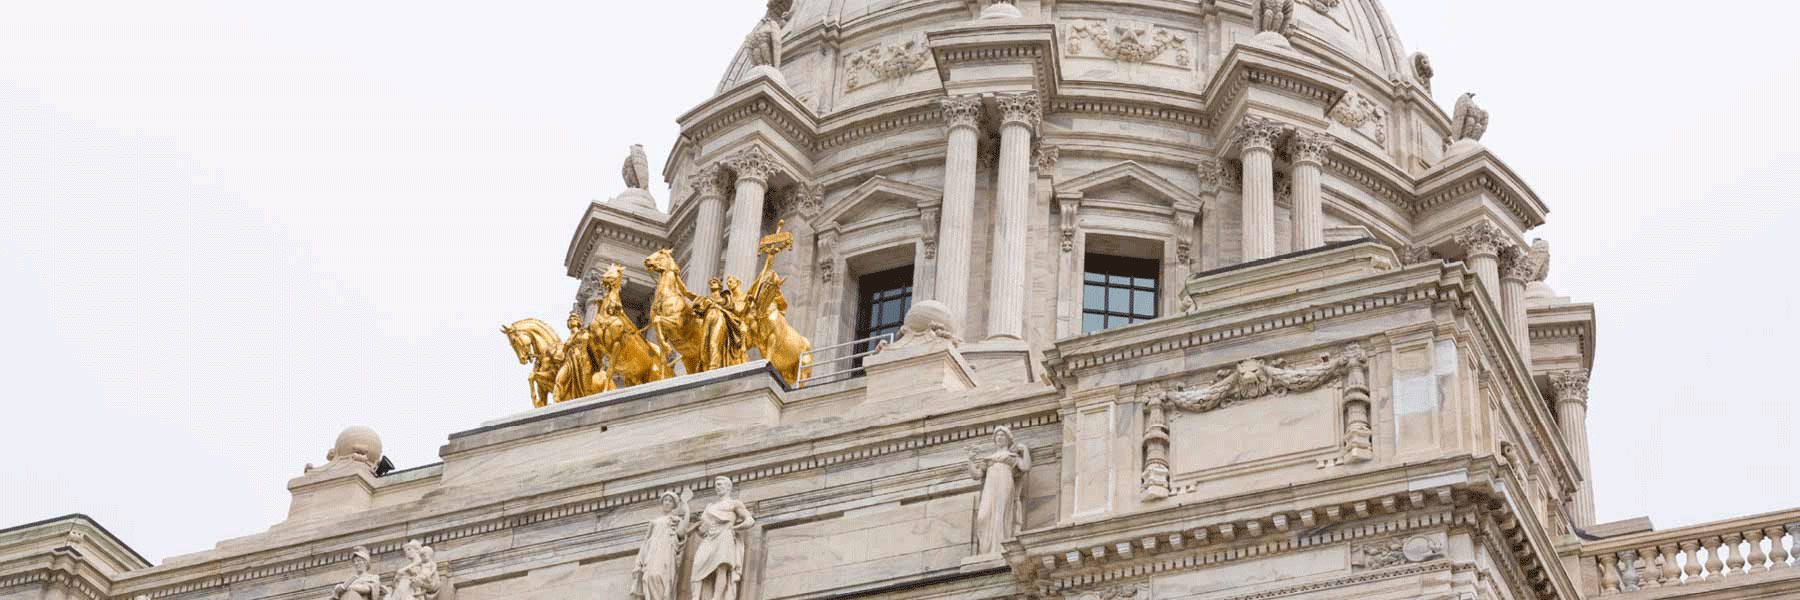 Minnesota State Capitol dome and Quadriga golden sculpture.